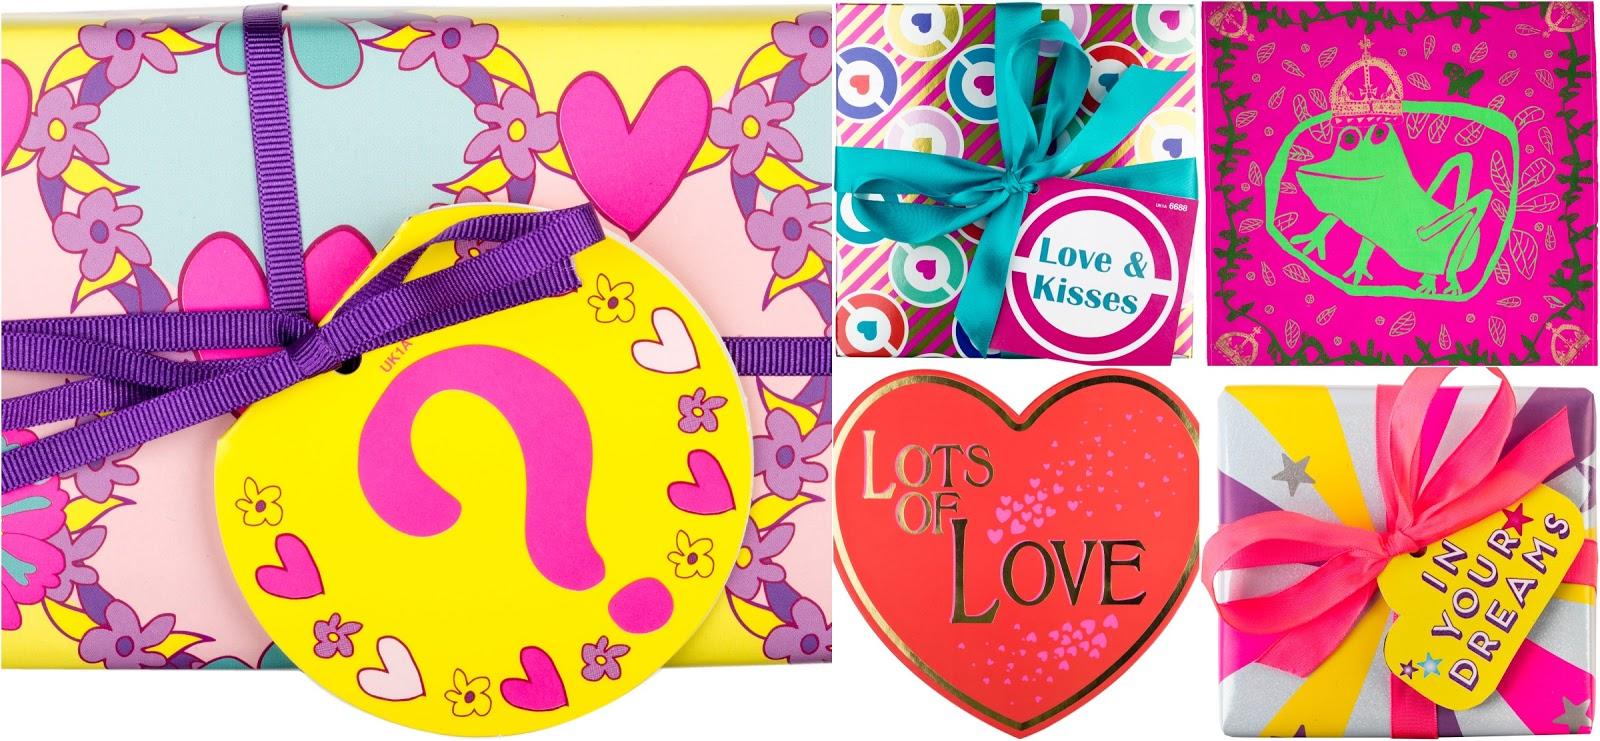 Lush-valentines-day-giftsets-2016